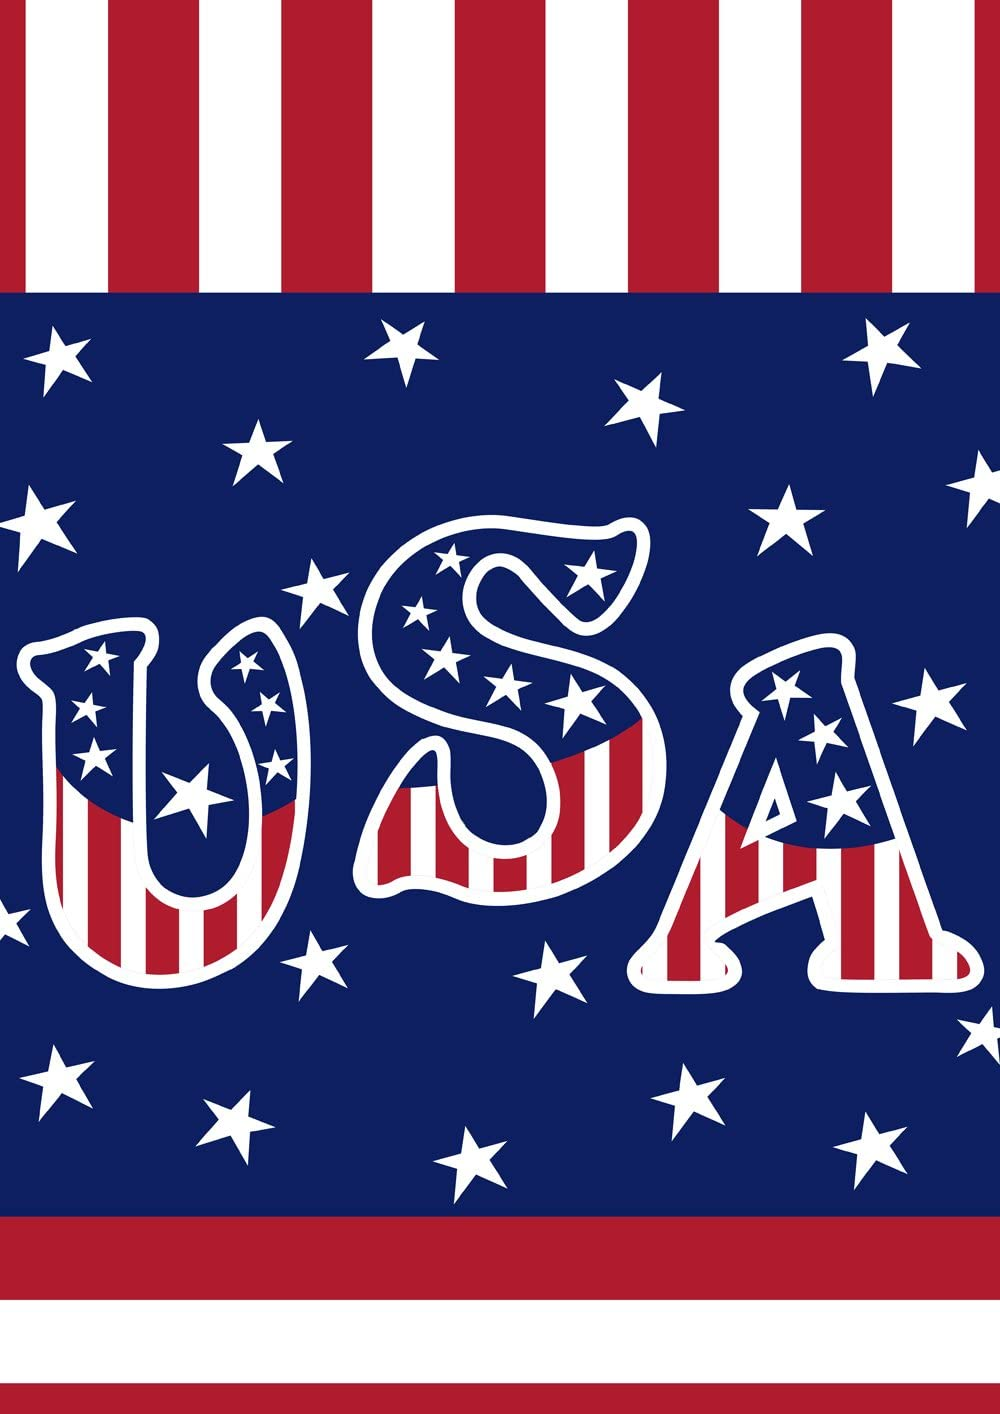 Toland Home Garden 112624 Veteran Salute 12.5 x 18 Inch Decorative, (12.5